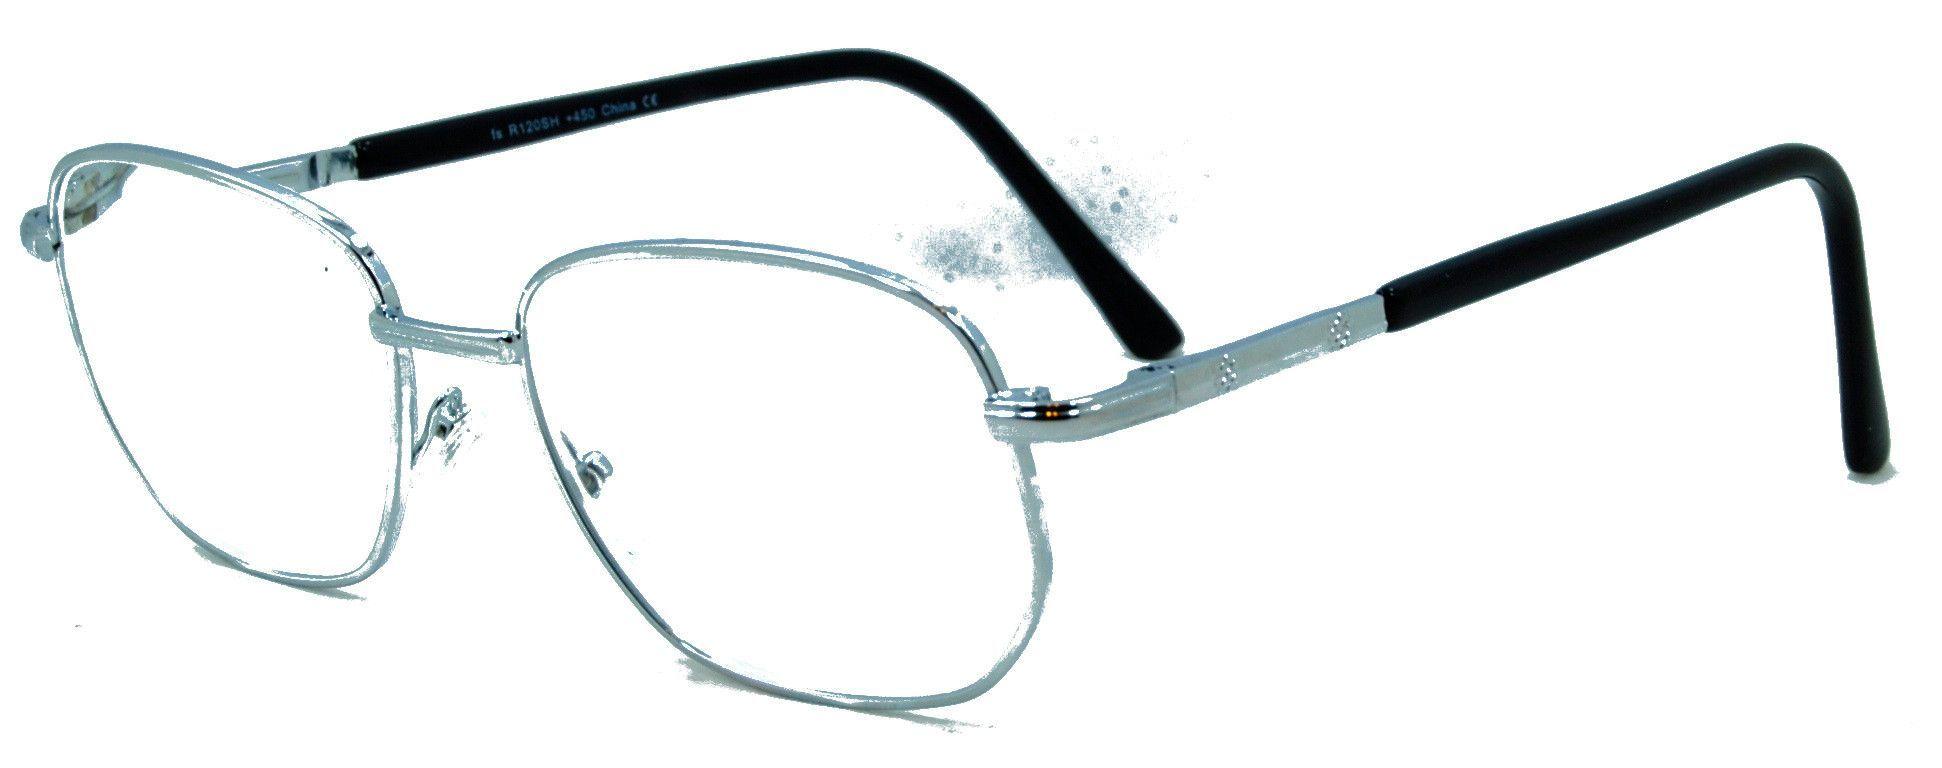 Super Strength III Extra Strength Reading Glasses